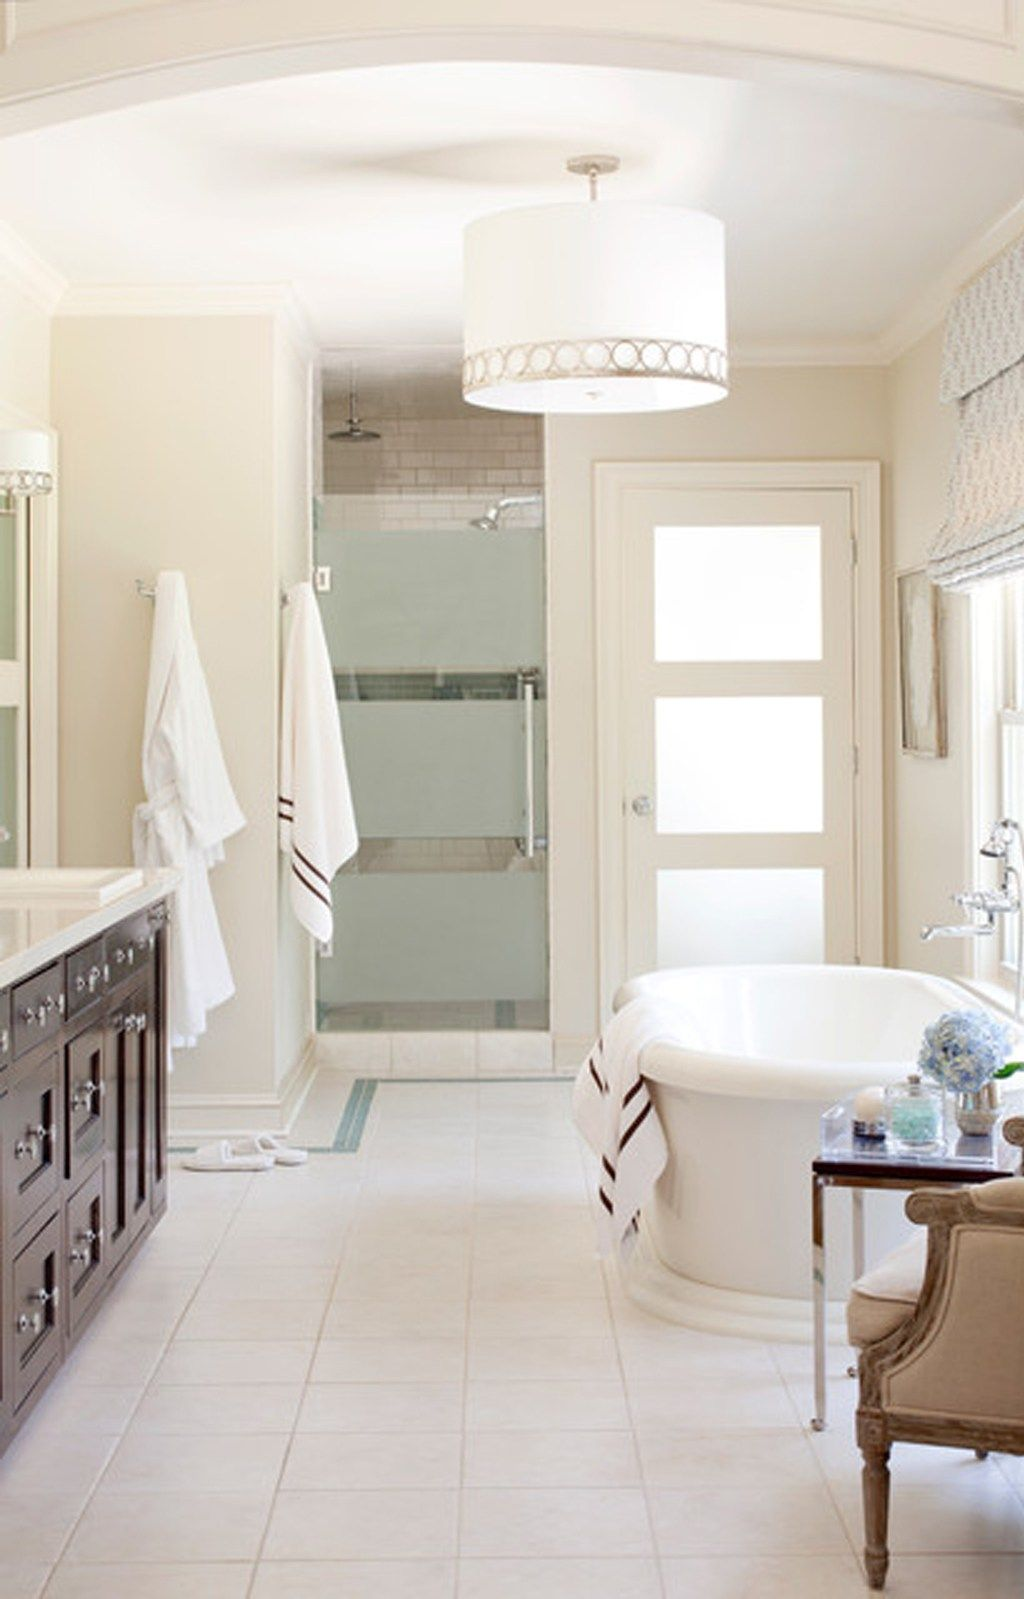 wool skein bathroom from tobi fairley interior design on designer interior paint colors id=11637